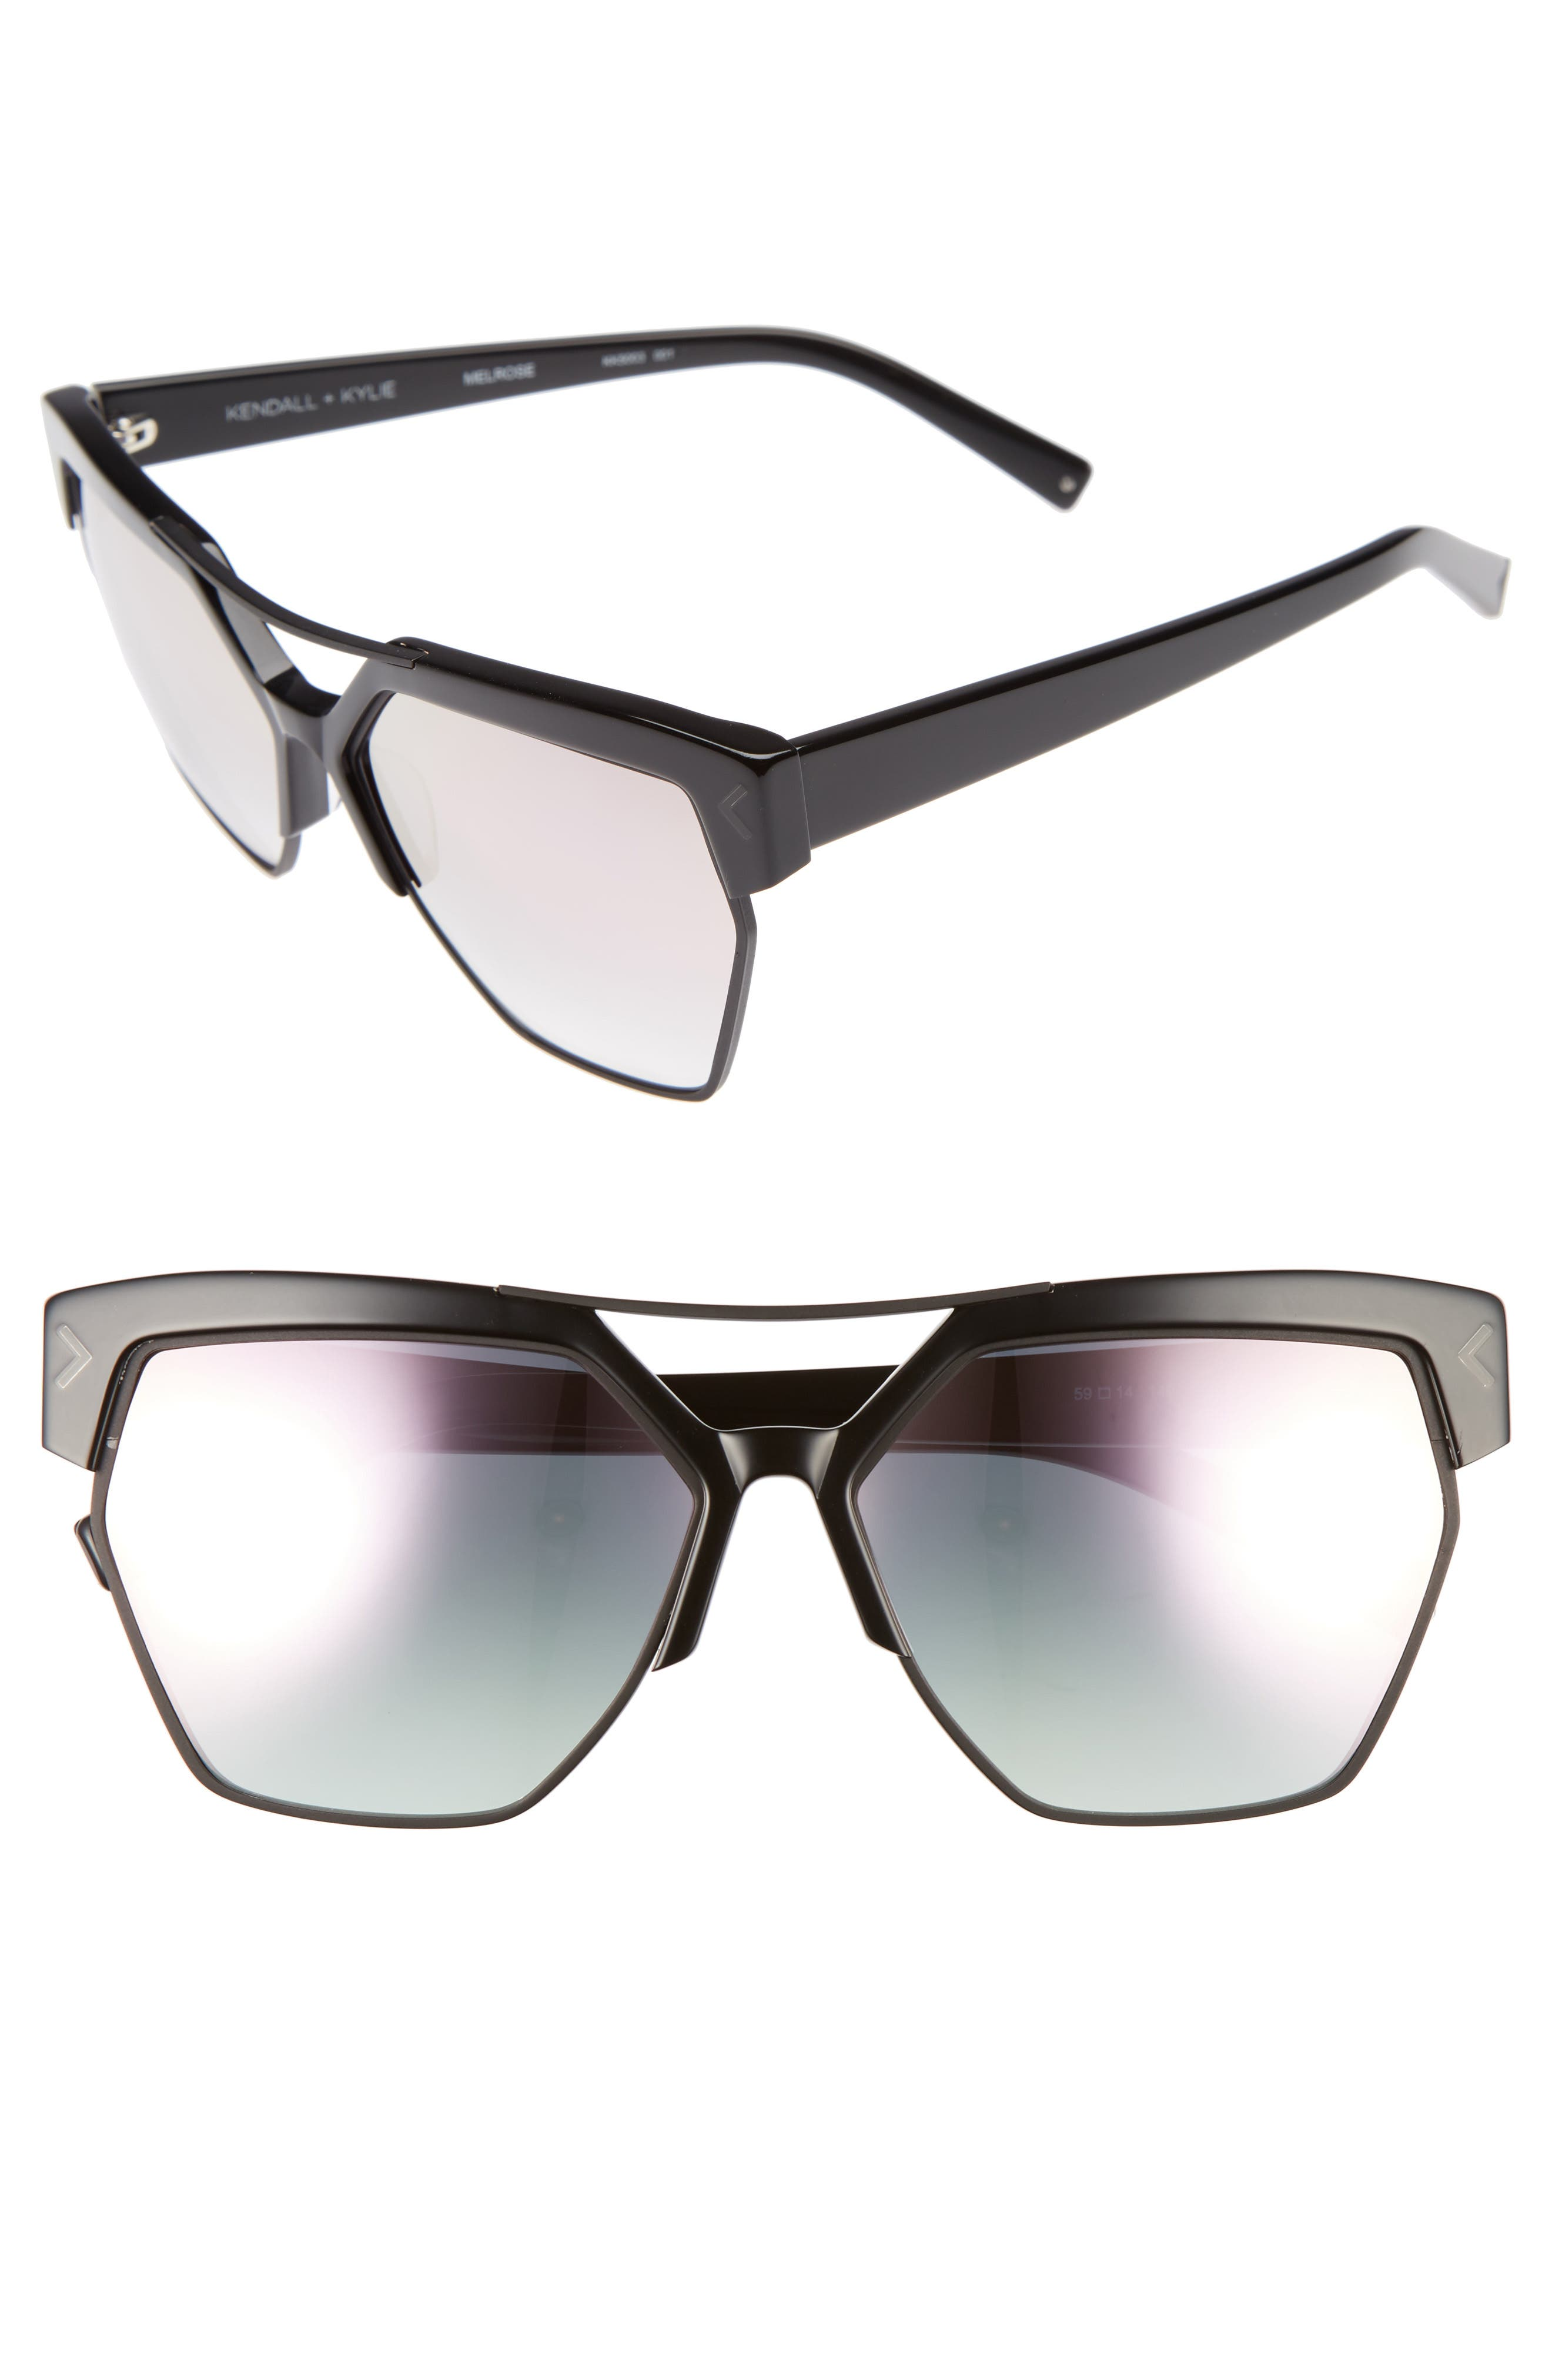 55mm Retro Sunglasses,                             Alternate thumbnail 5, color,